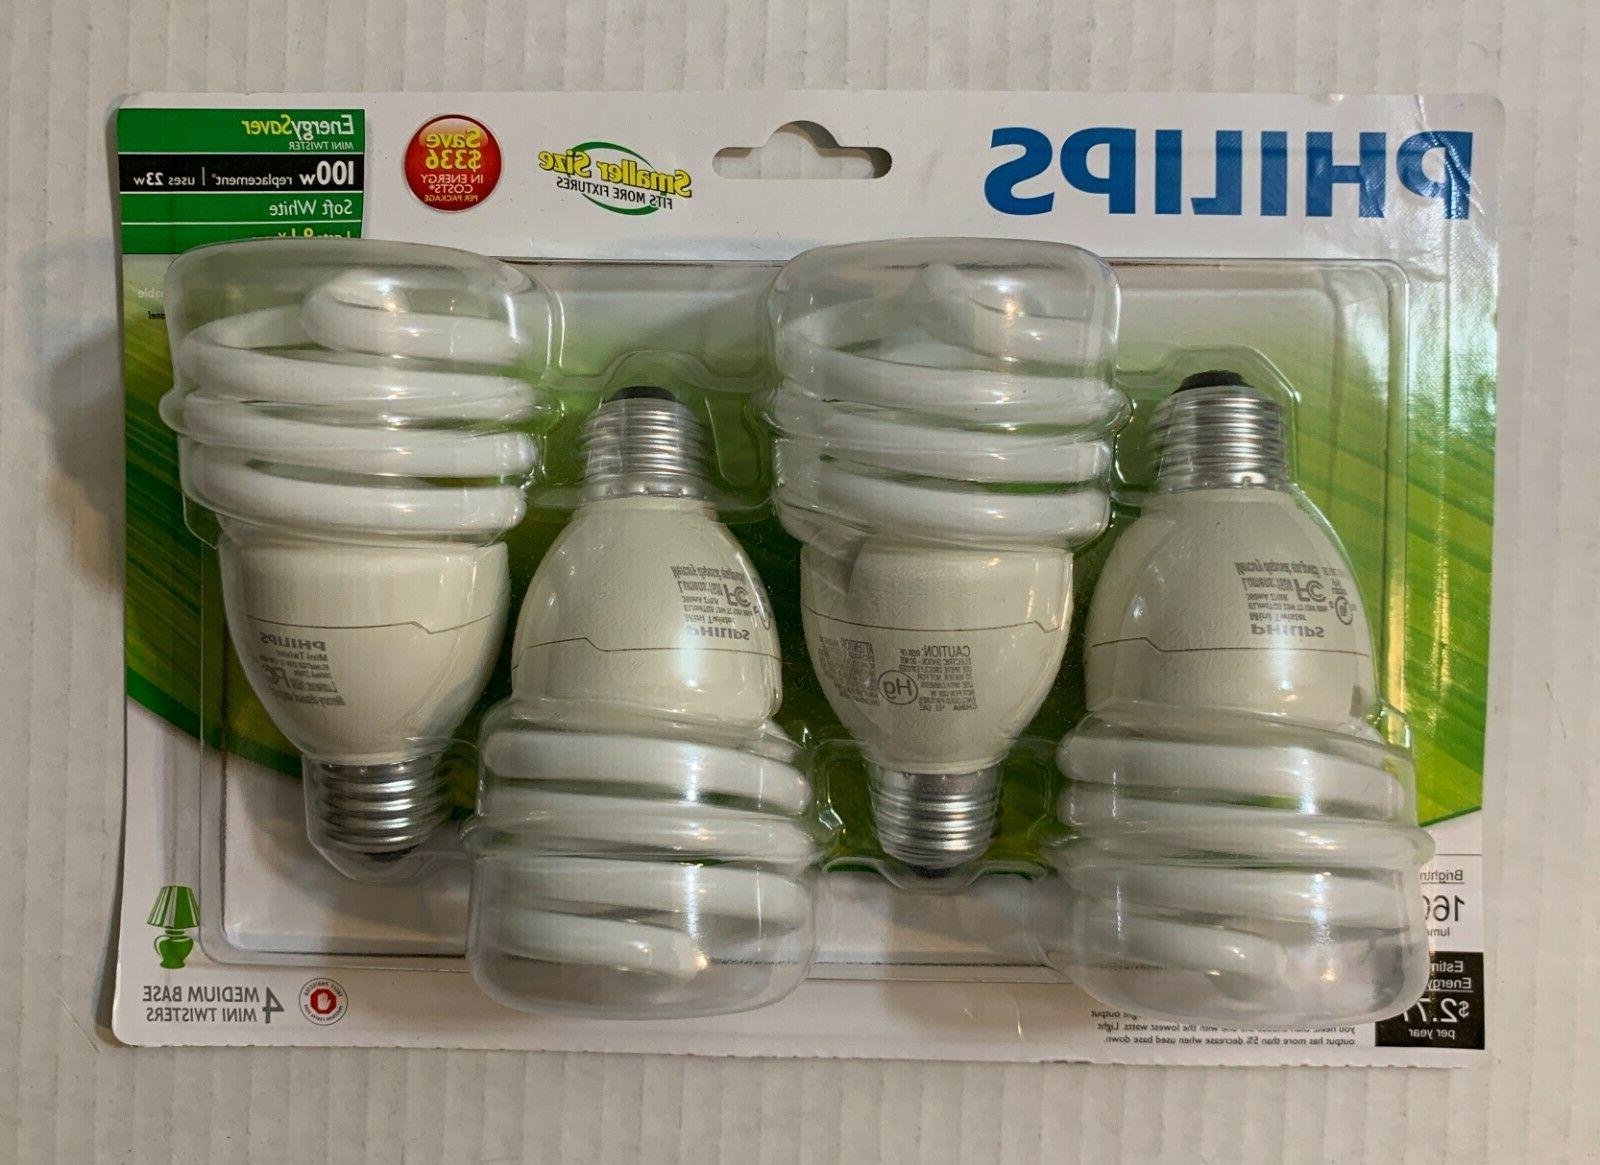 Philips 417097 Energy Saver 23-Watt 100W Soft White CFL Ligh